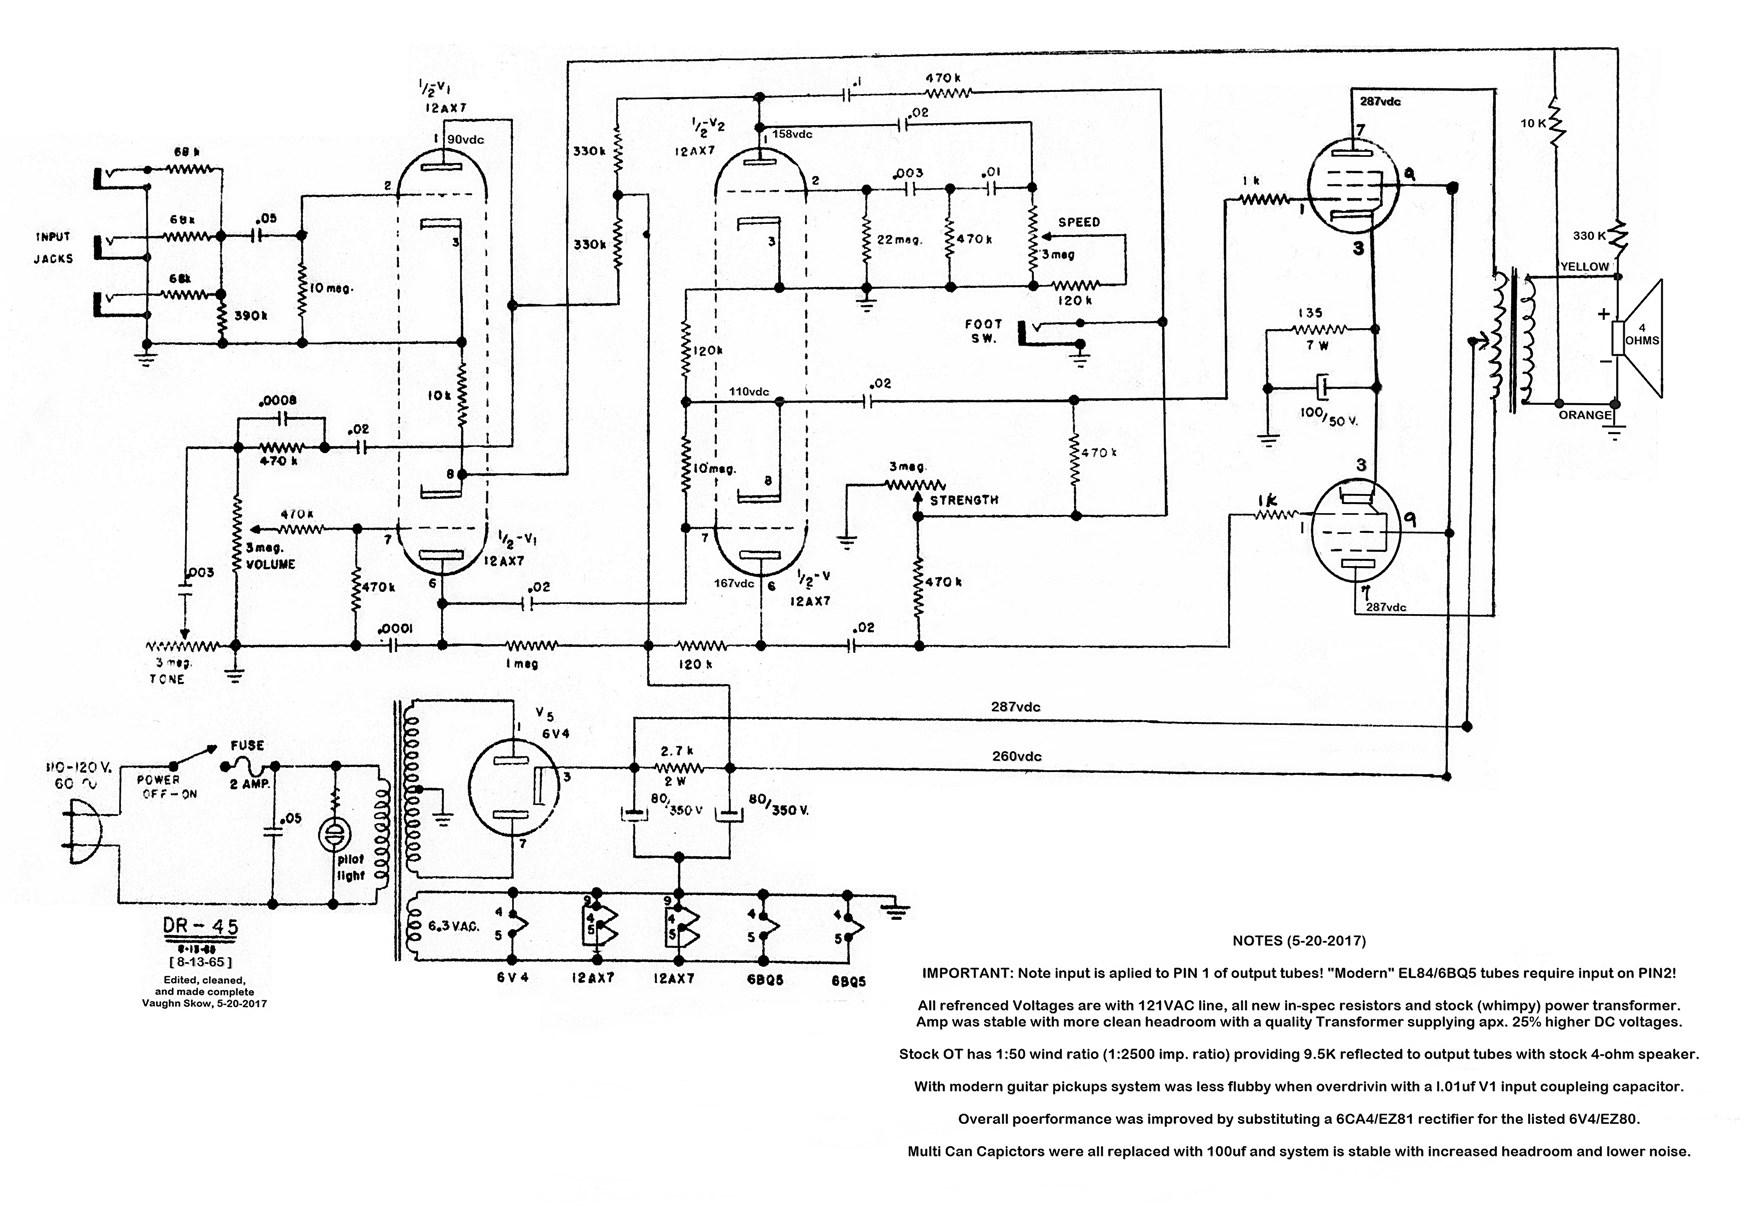 Vintage Kent DR54 Tube Amp schematic